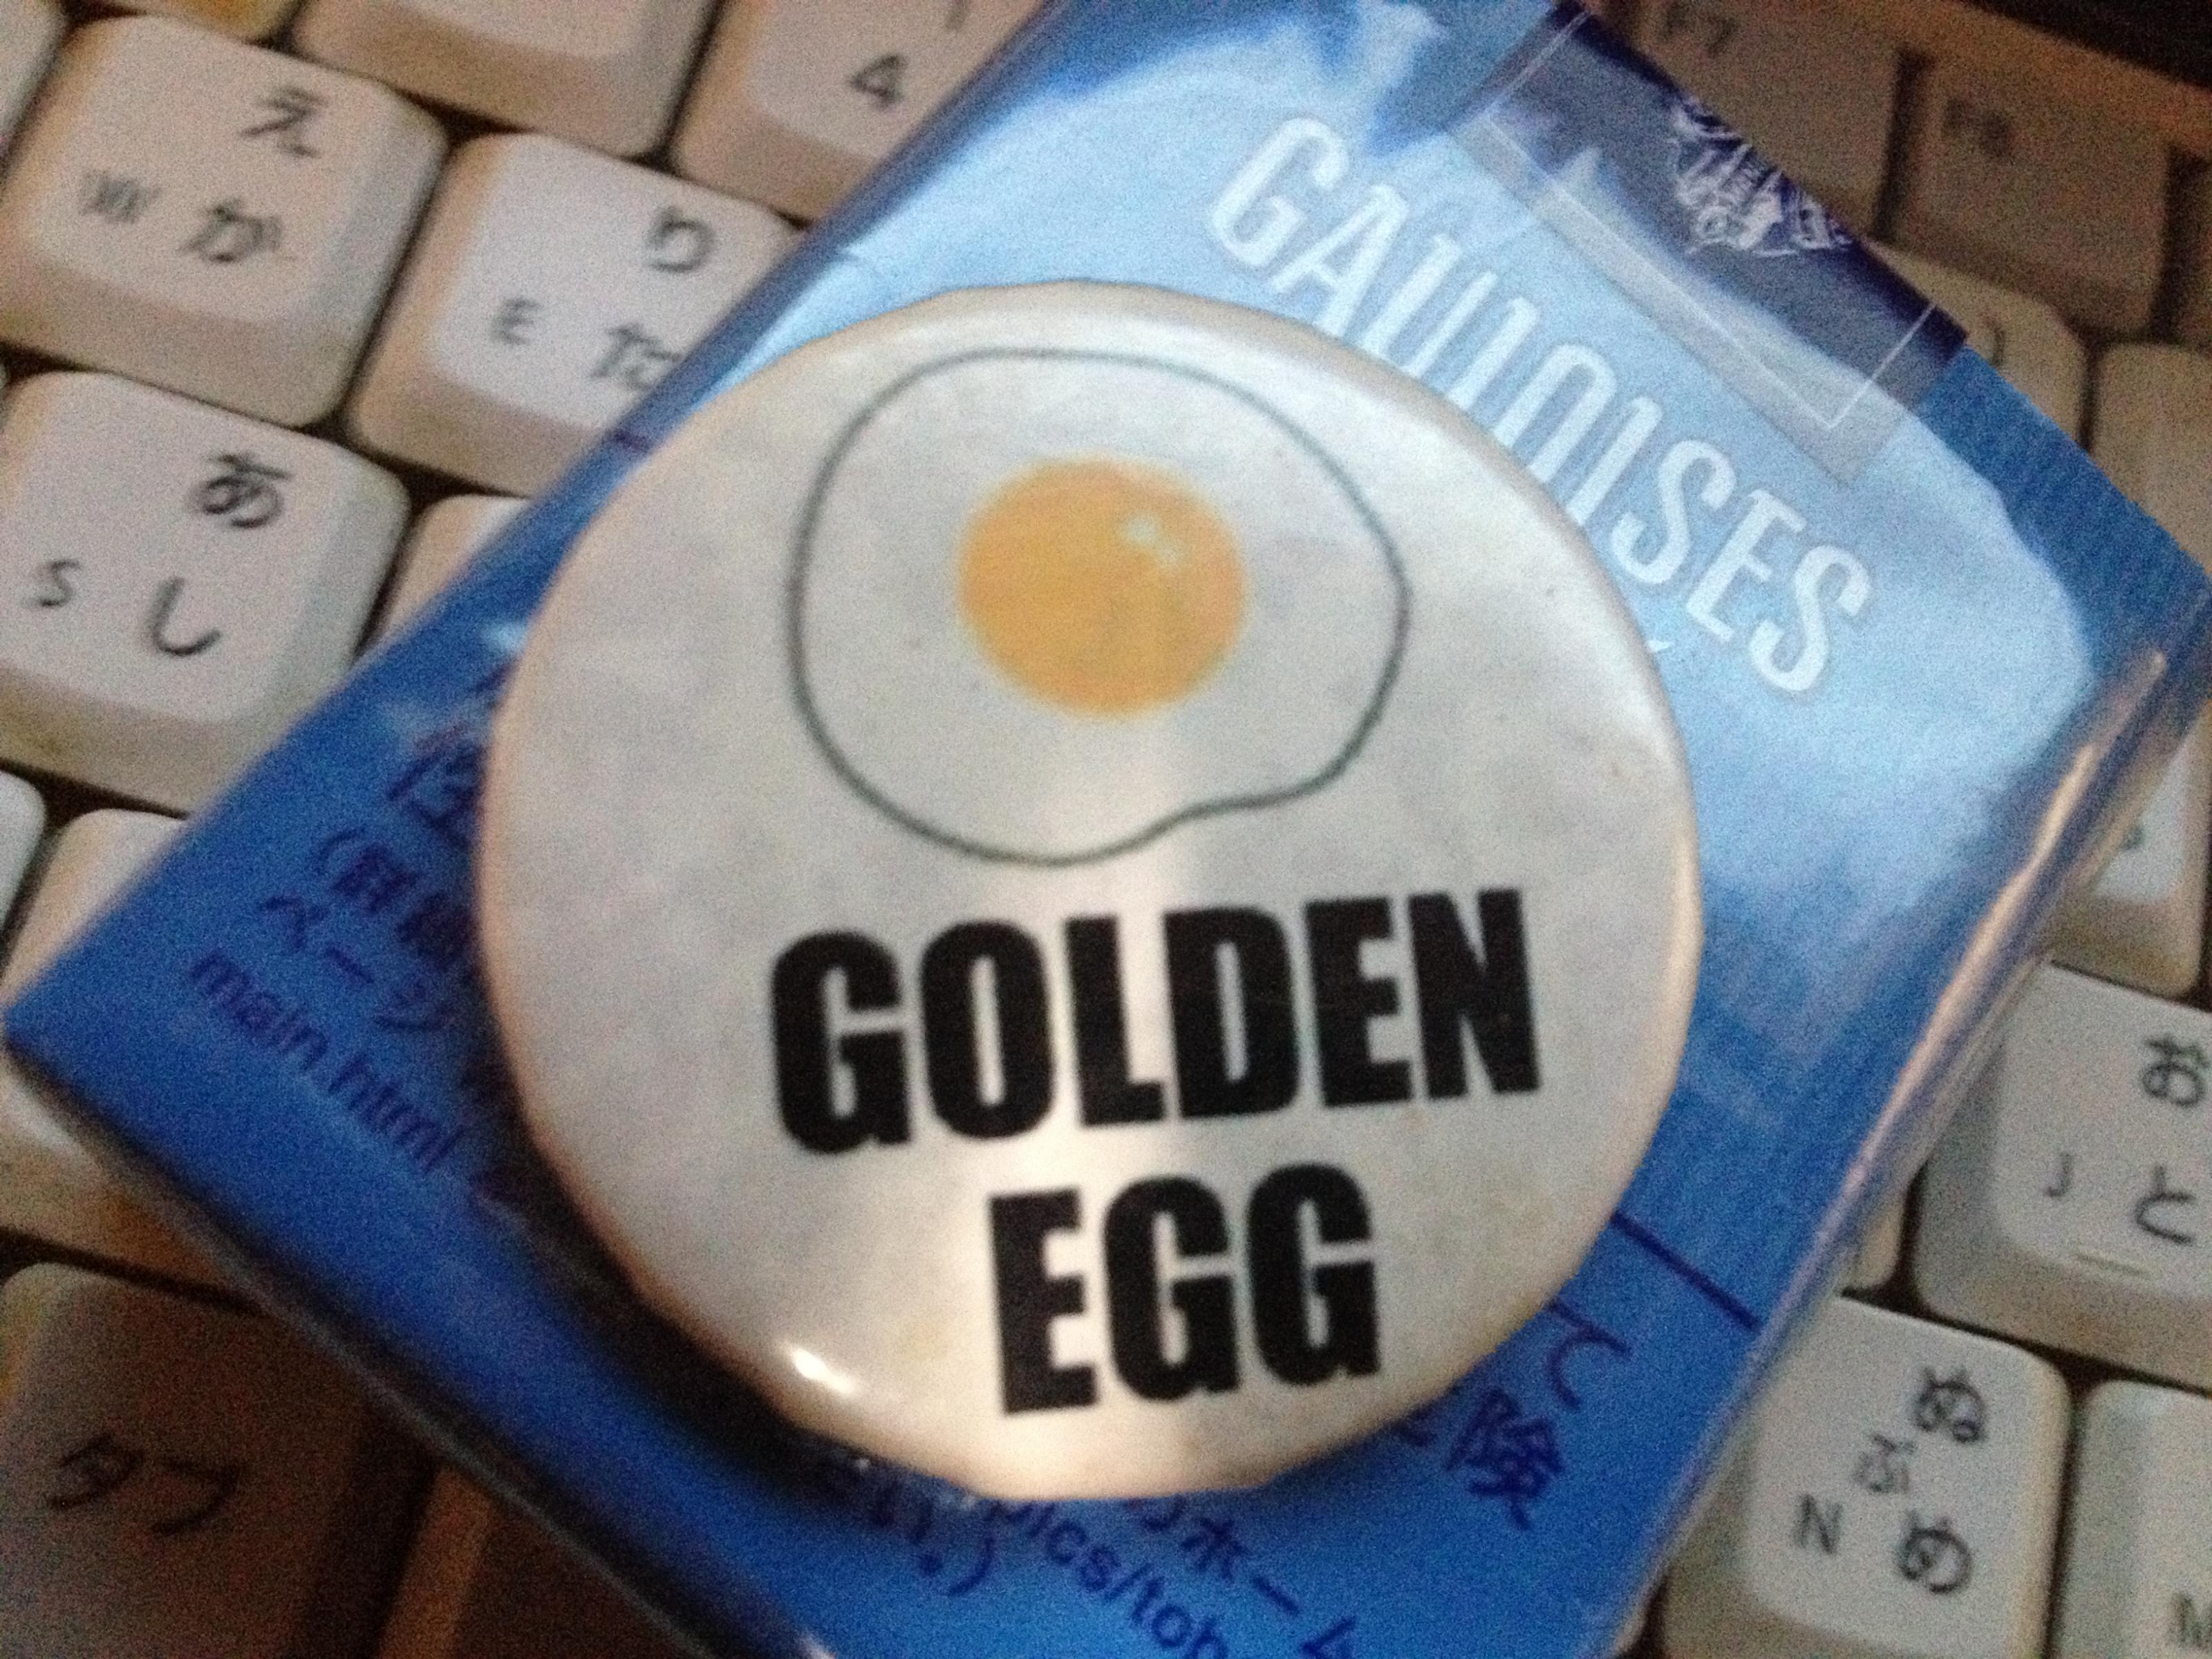 Golden Eggのピンバッヂ。レアものかもしれません。